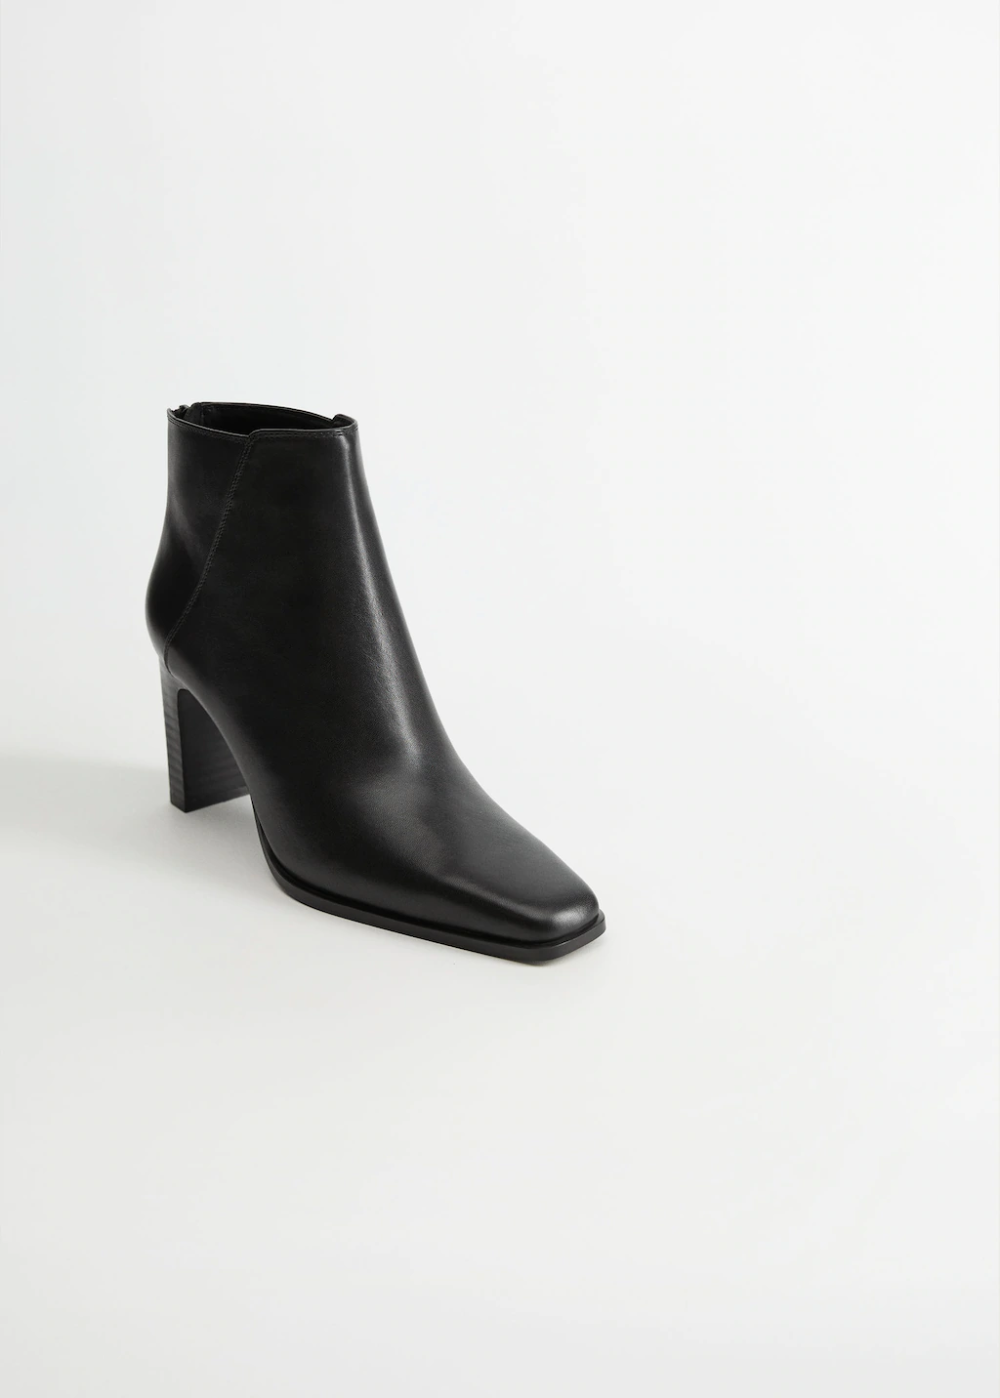 Skorzane Botki Na Obcasie Kobieta Mango Polska Boots Womens Boots Ankle Leather Ankle Boots